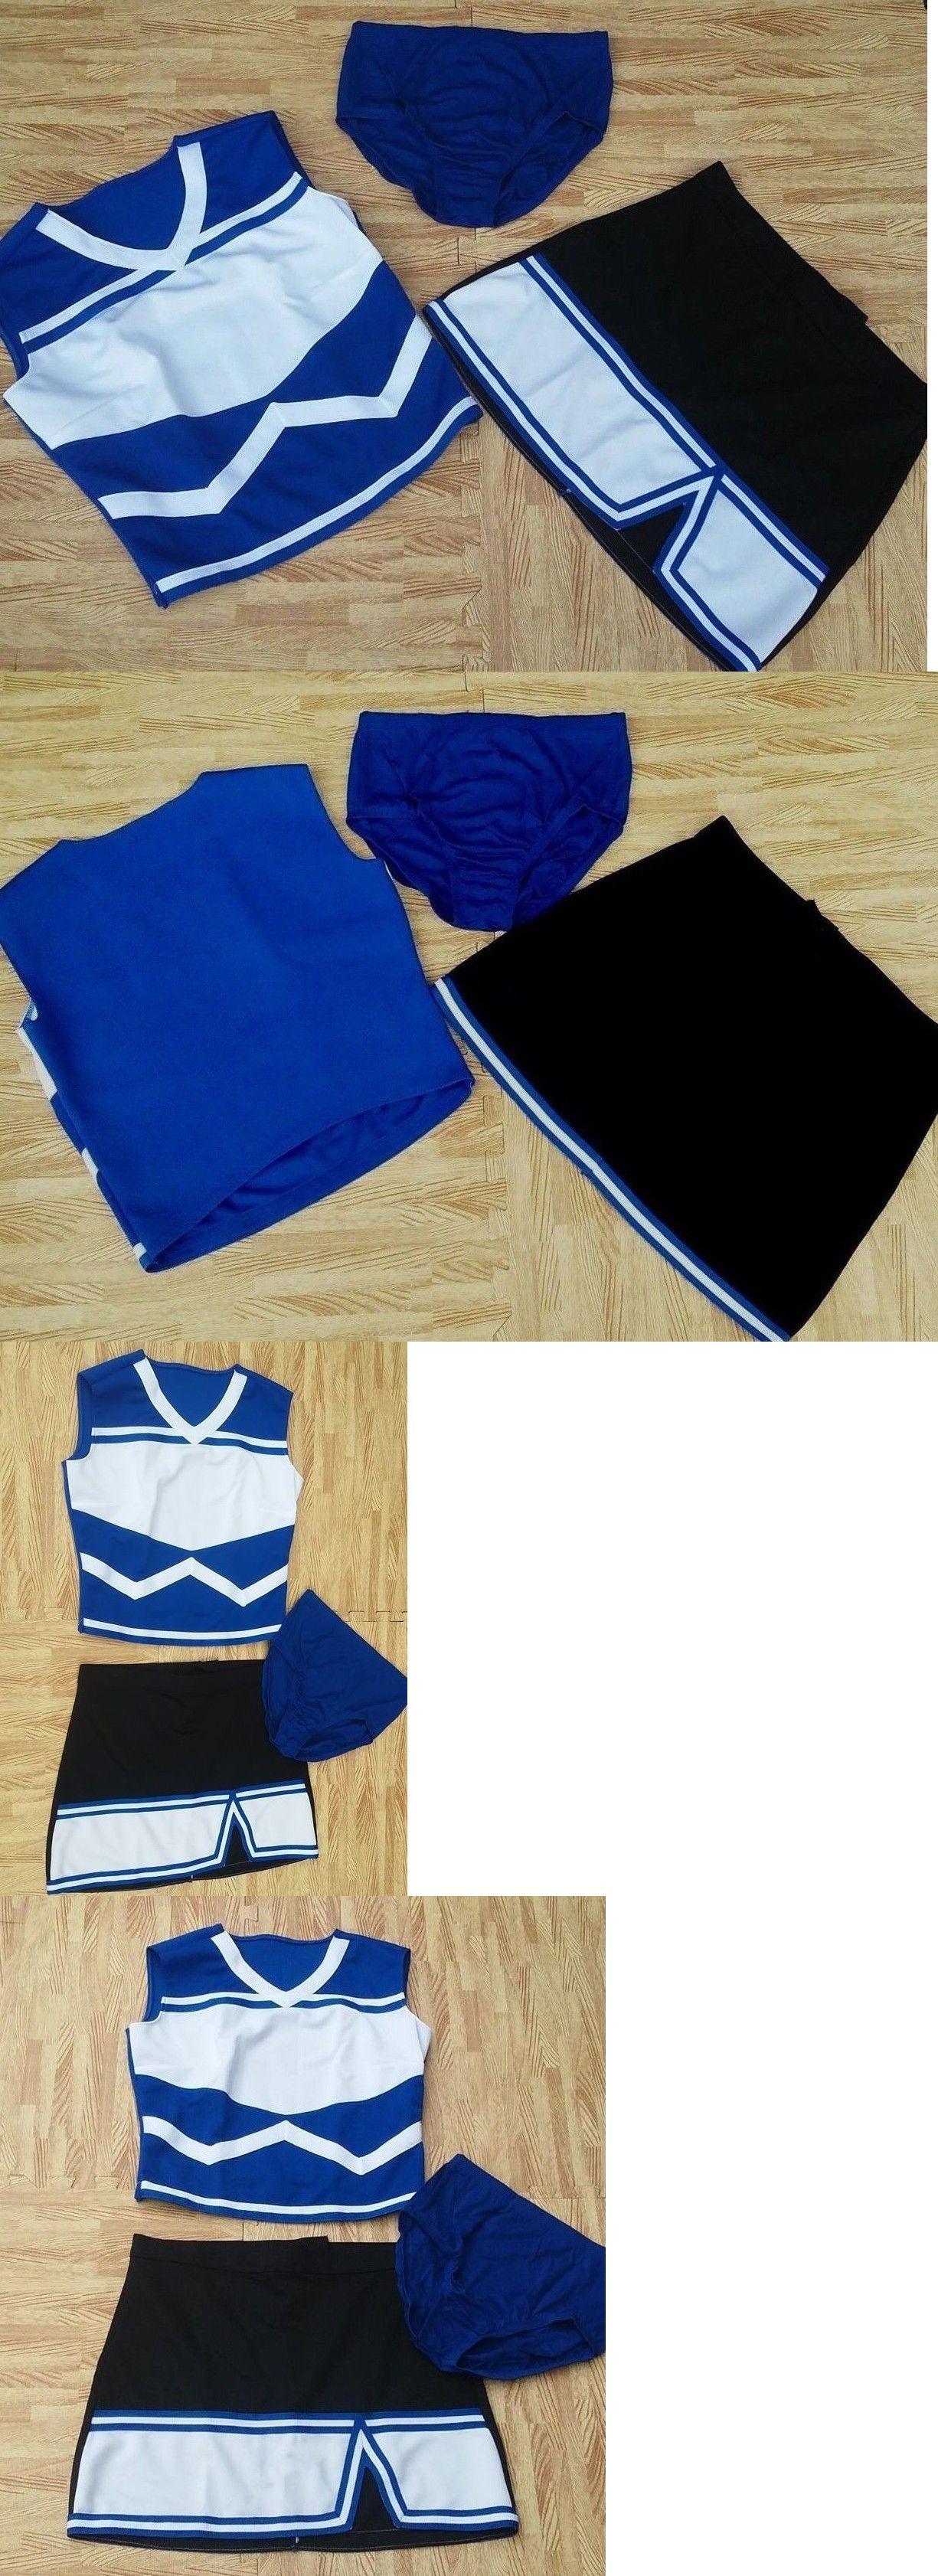 fbc23586aa9 Cheerleading 66832  Real Royal Blue Black Cheerleader Uniform M Top L Skirt  Briefs 35-